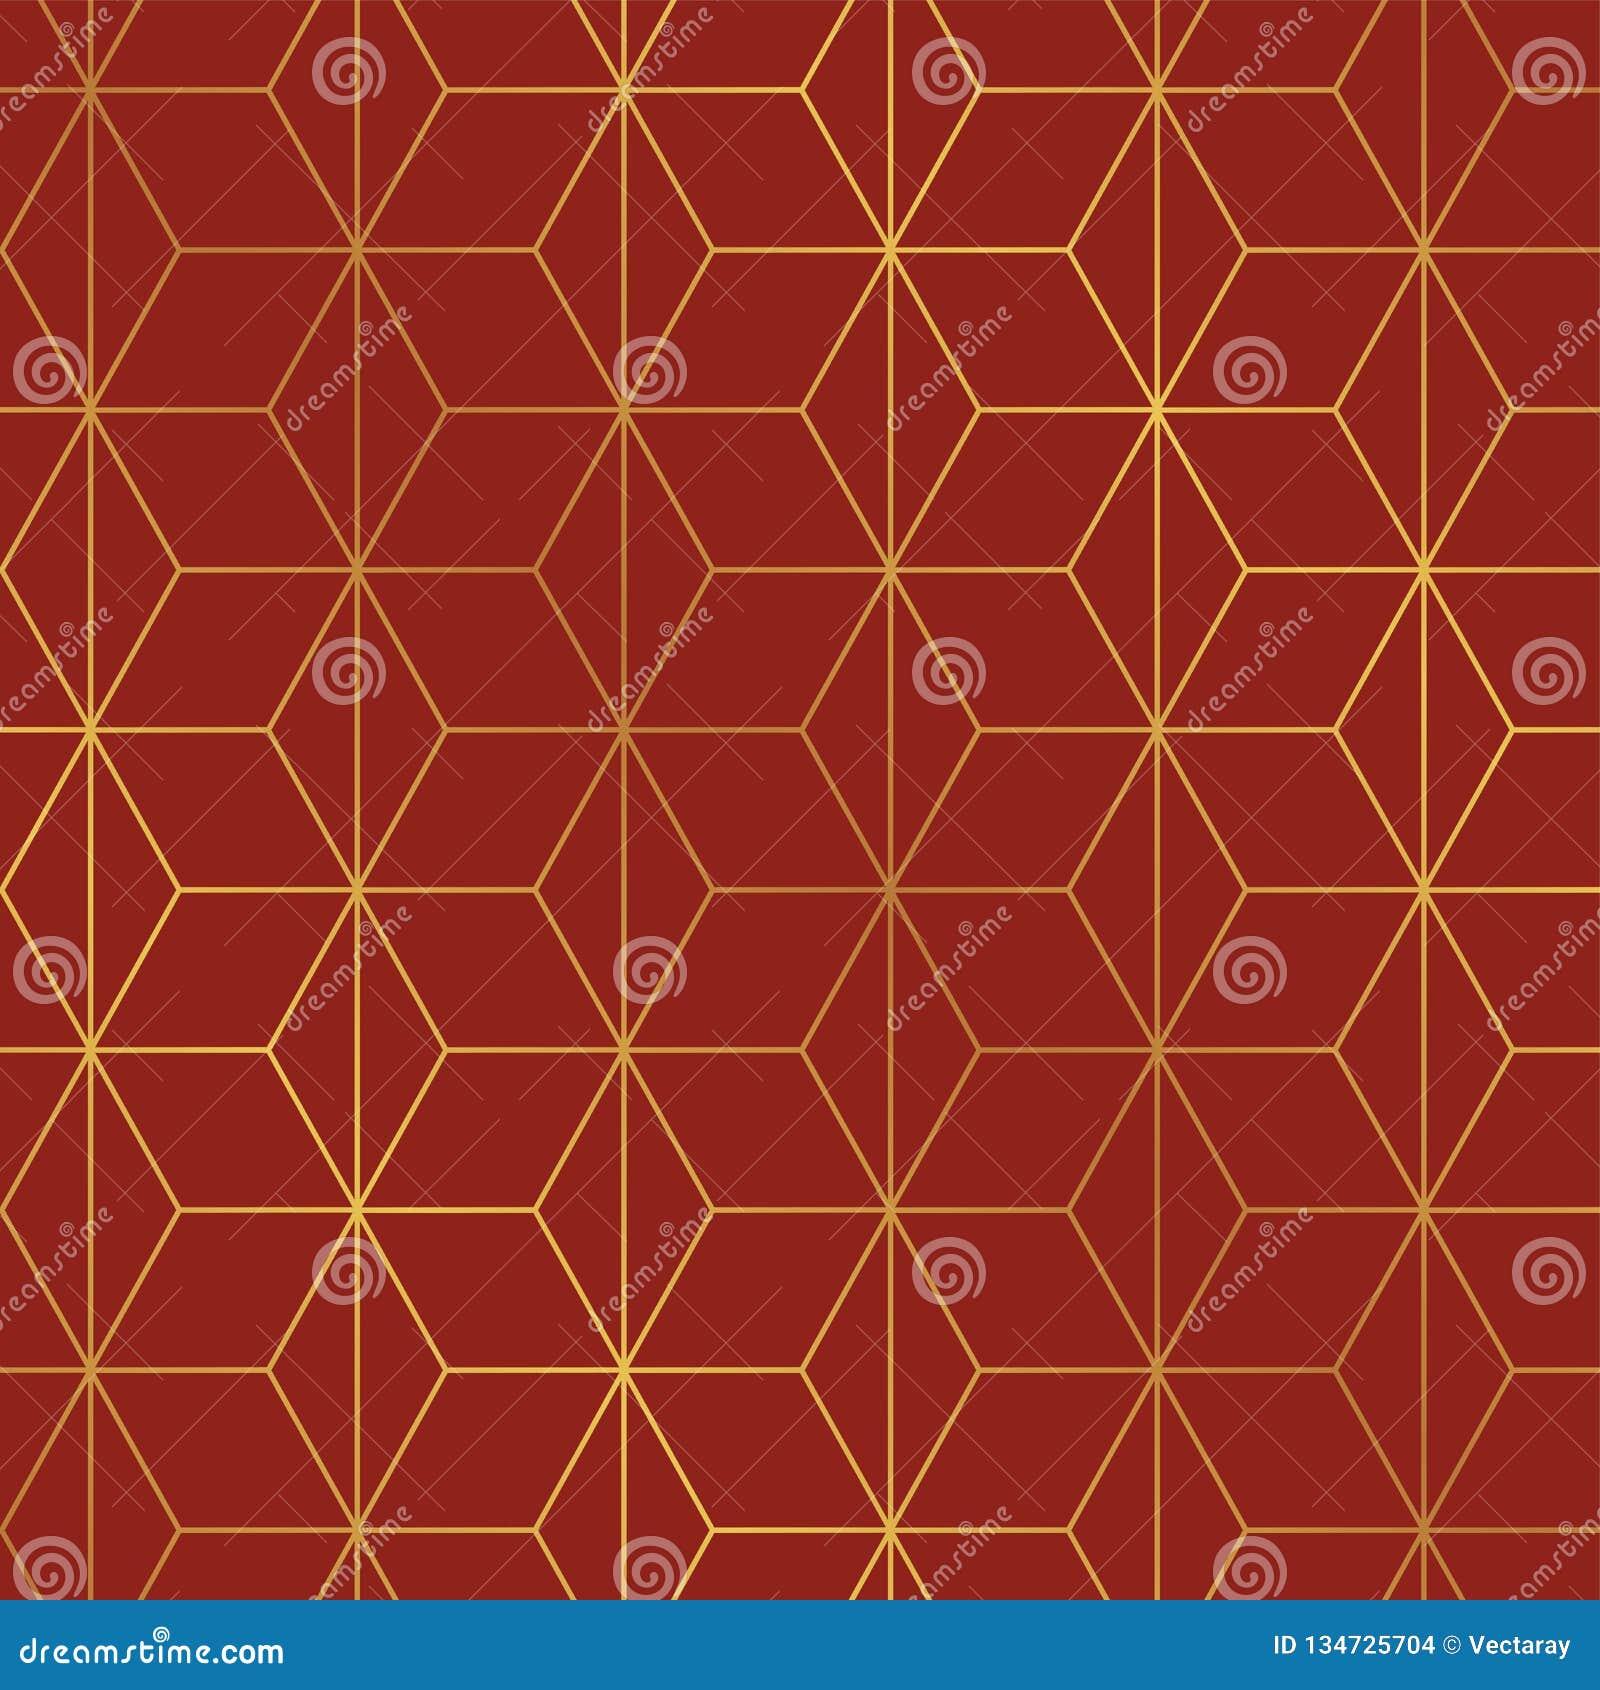 Diamond Trellis Throw in Red Heart Super Saver Economy ...  |Diamond Trellis Pattern Red Heart